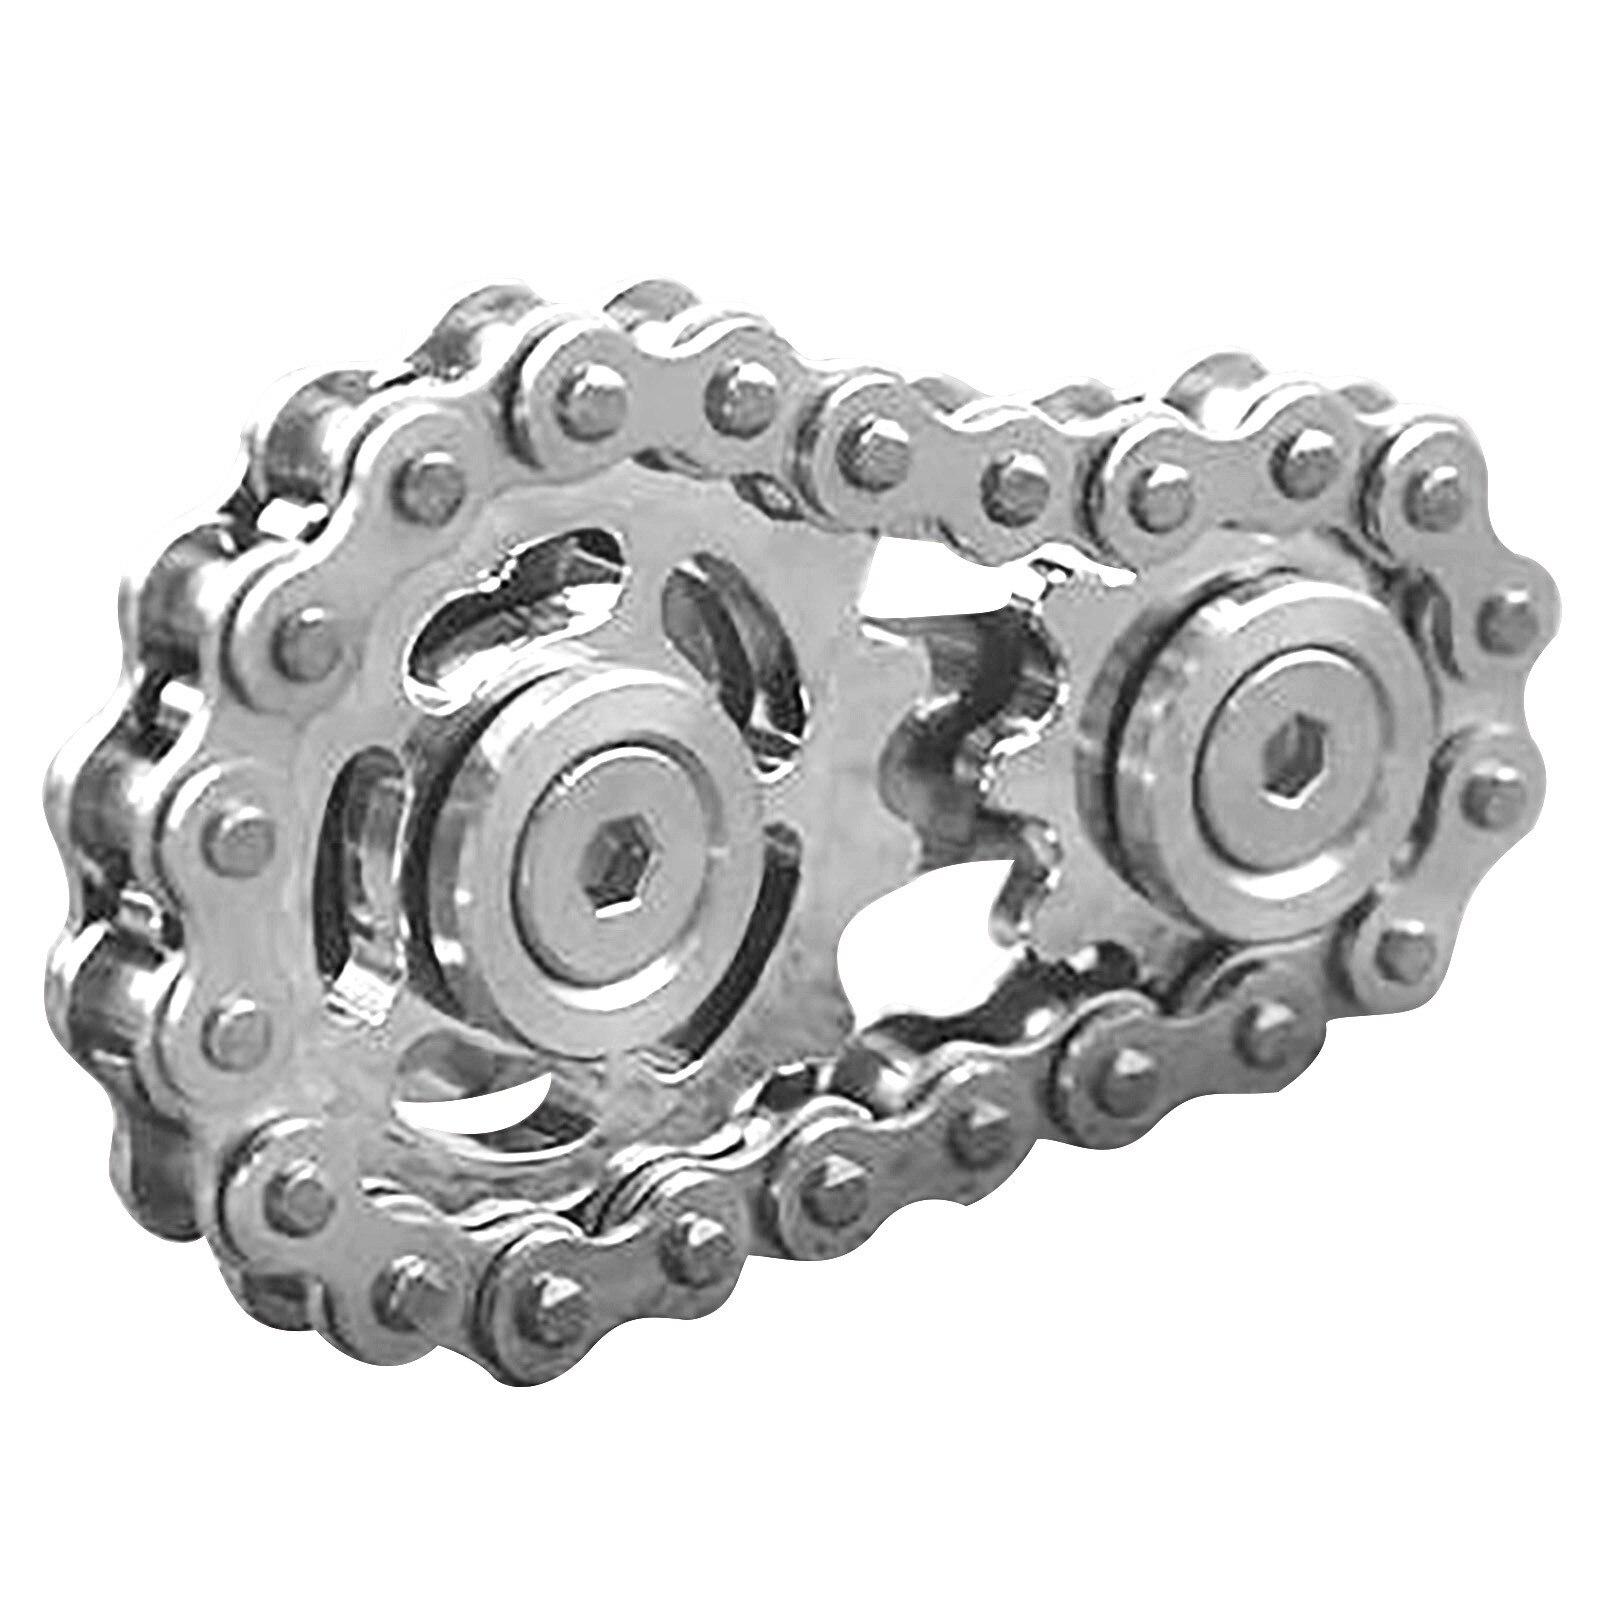 Fingertip gyro Sprocket Flywheel Fingertip Toy Educational Decompression Metal Toys Gear Drop Ship Sproket Roadbike Spinner 5* enlarge